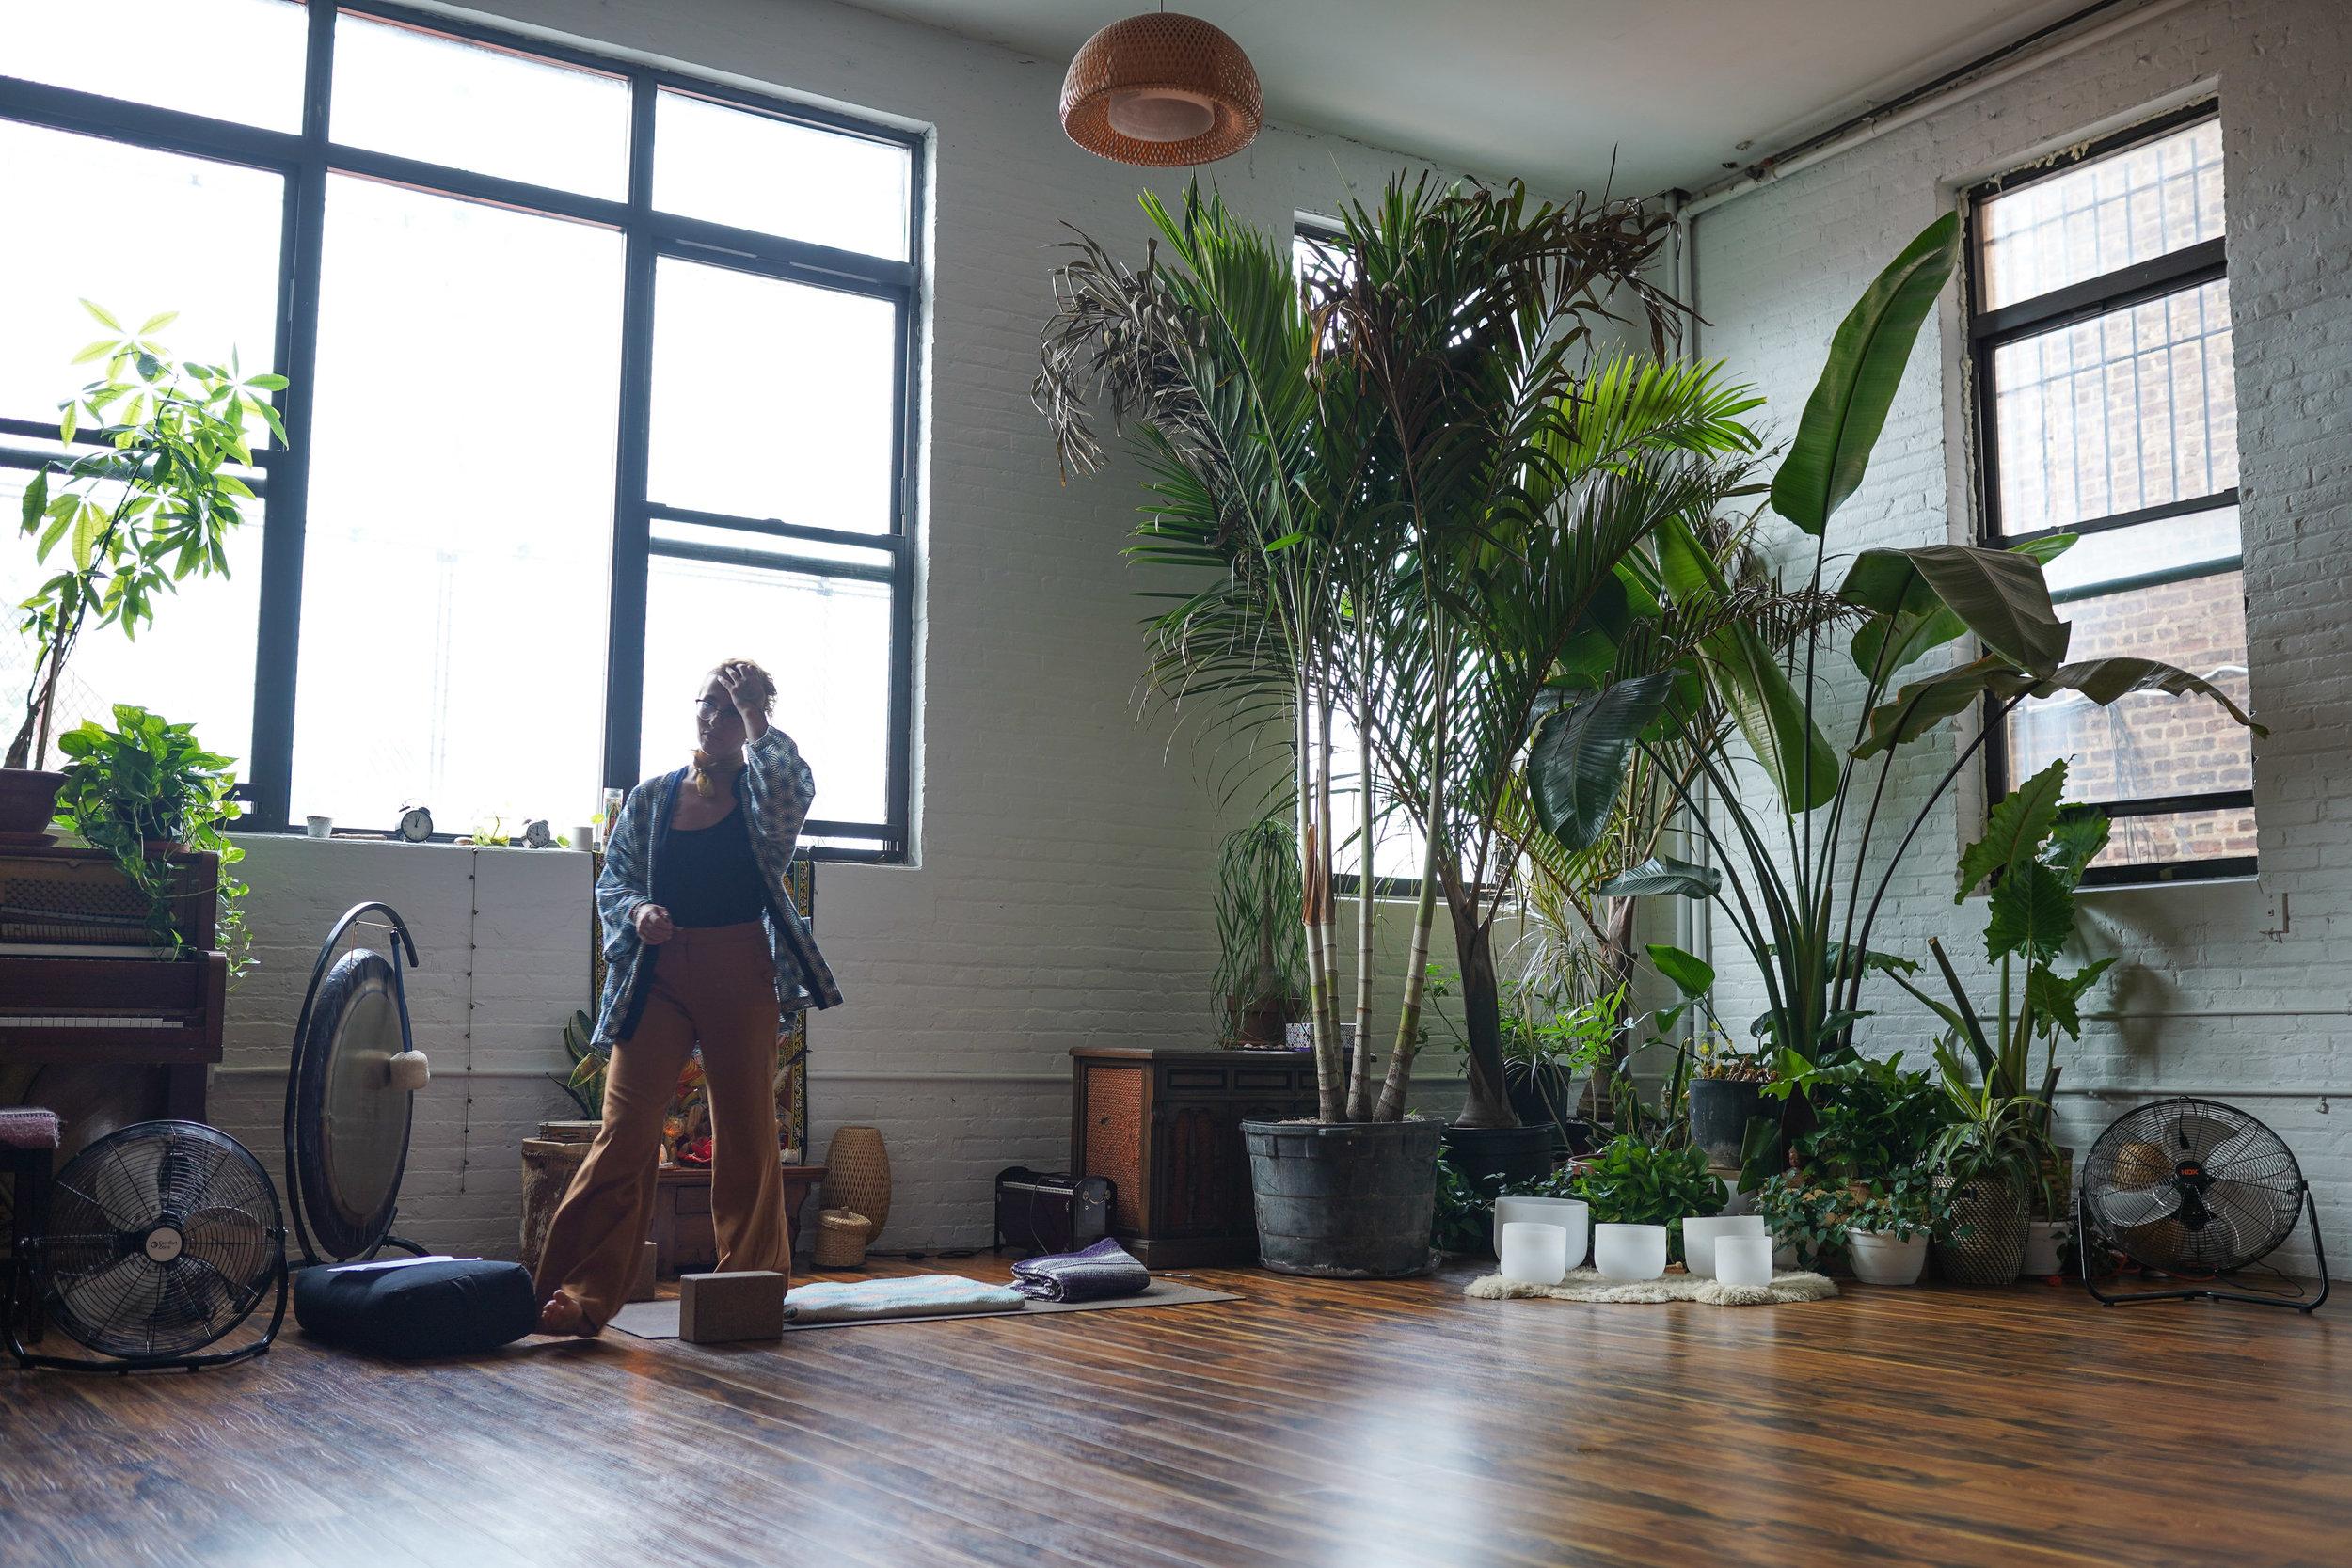 Daya Jungle / Photo by: Gonzalo Marroquin